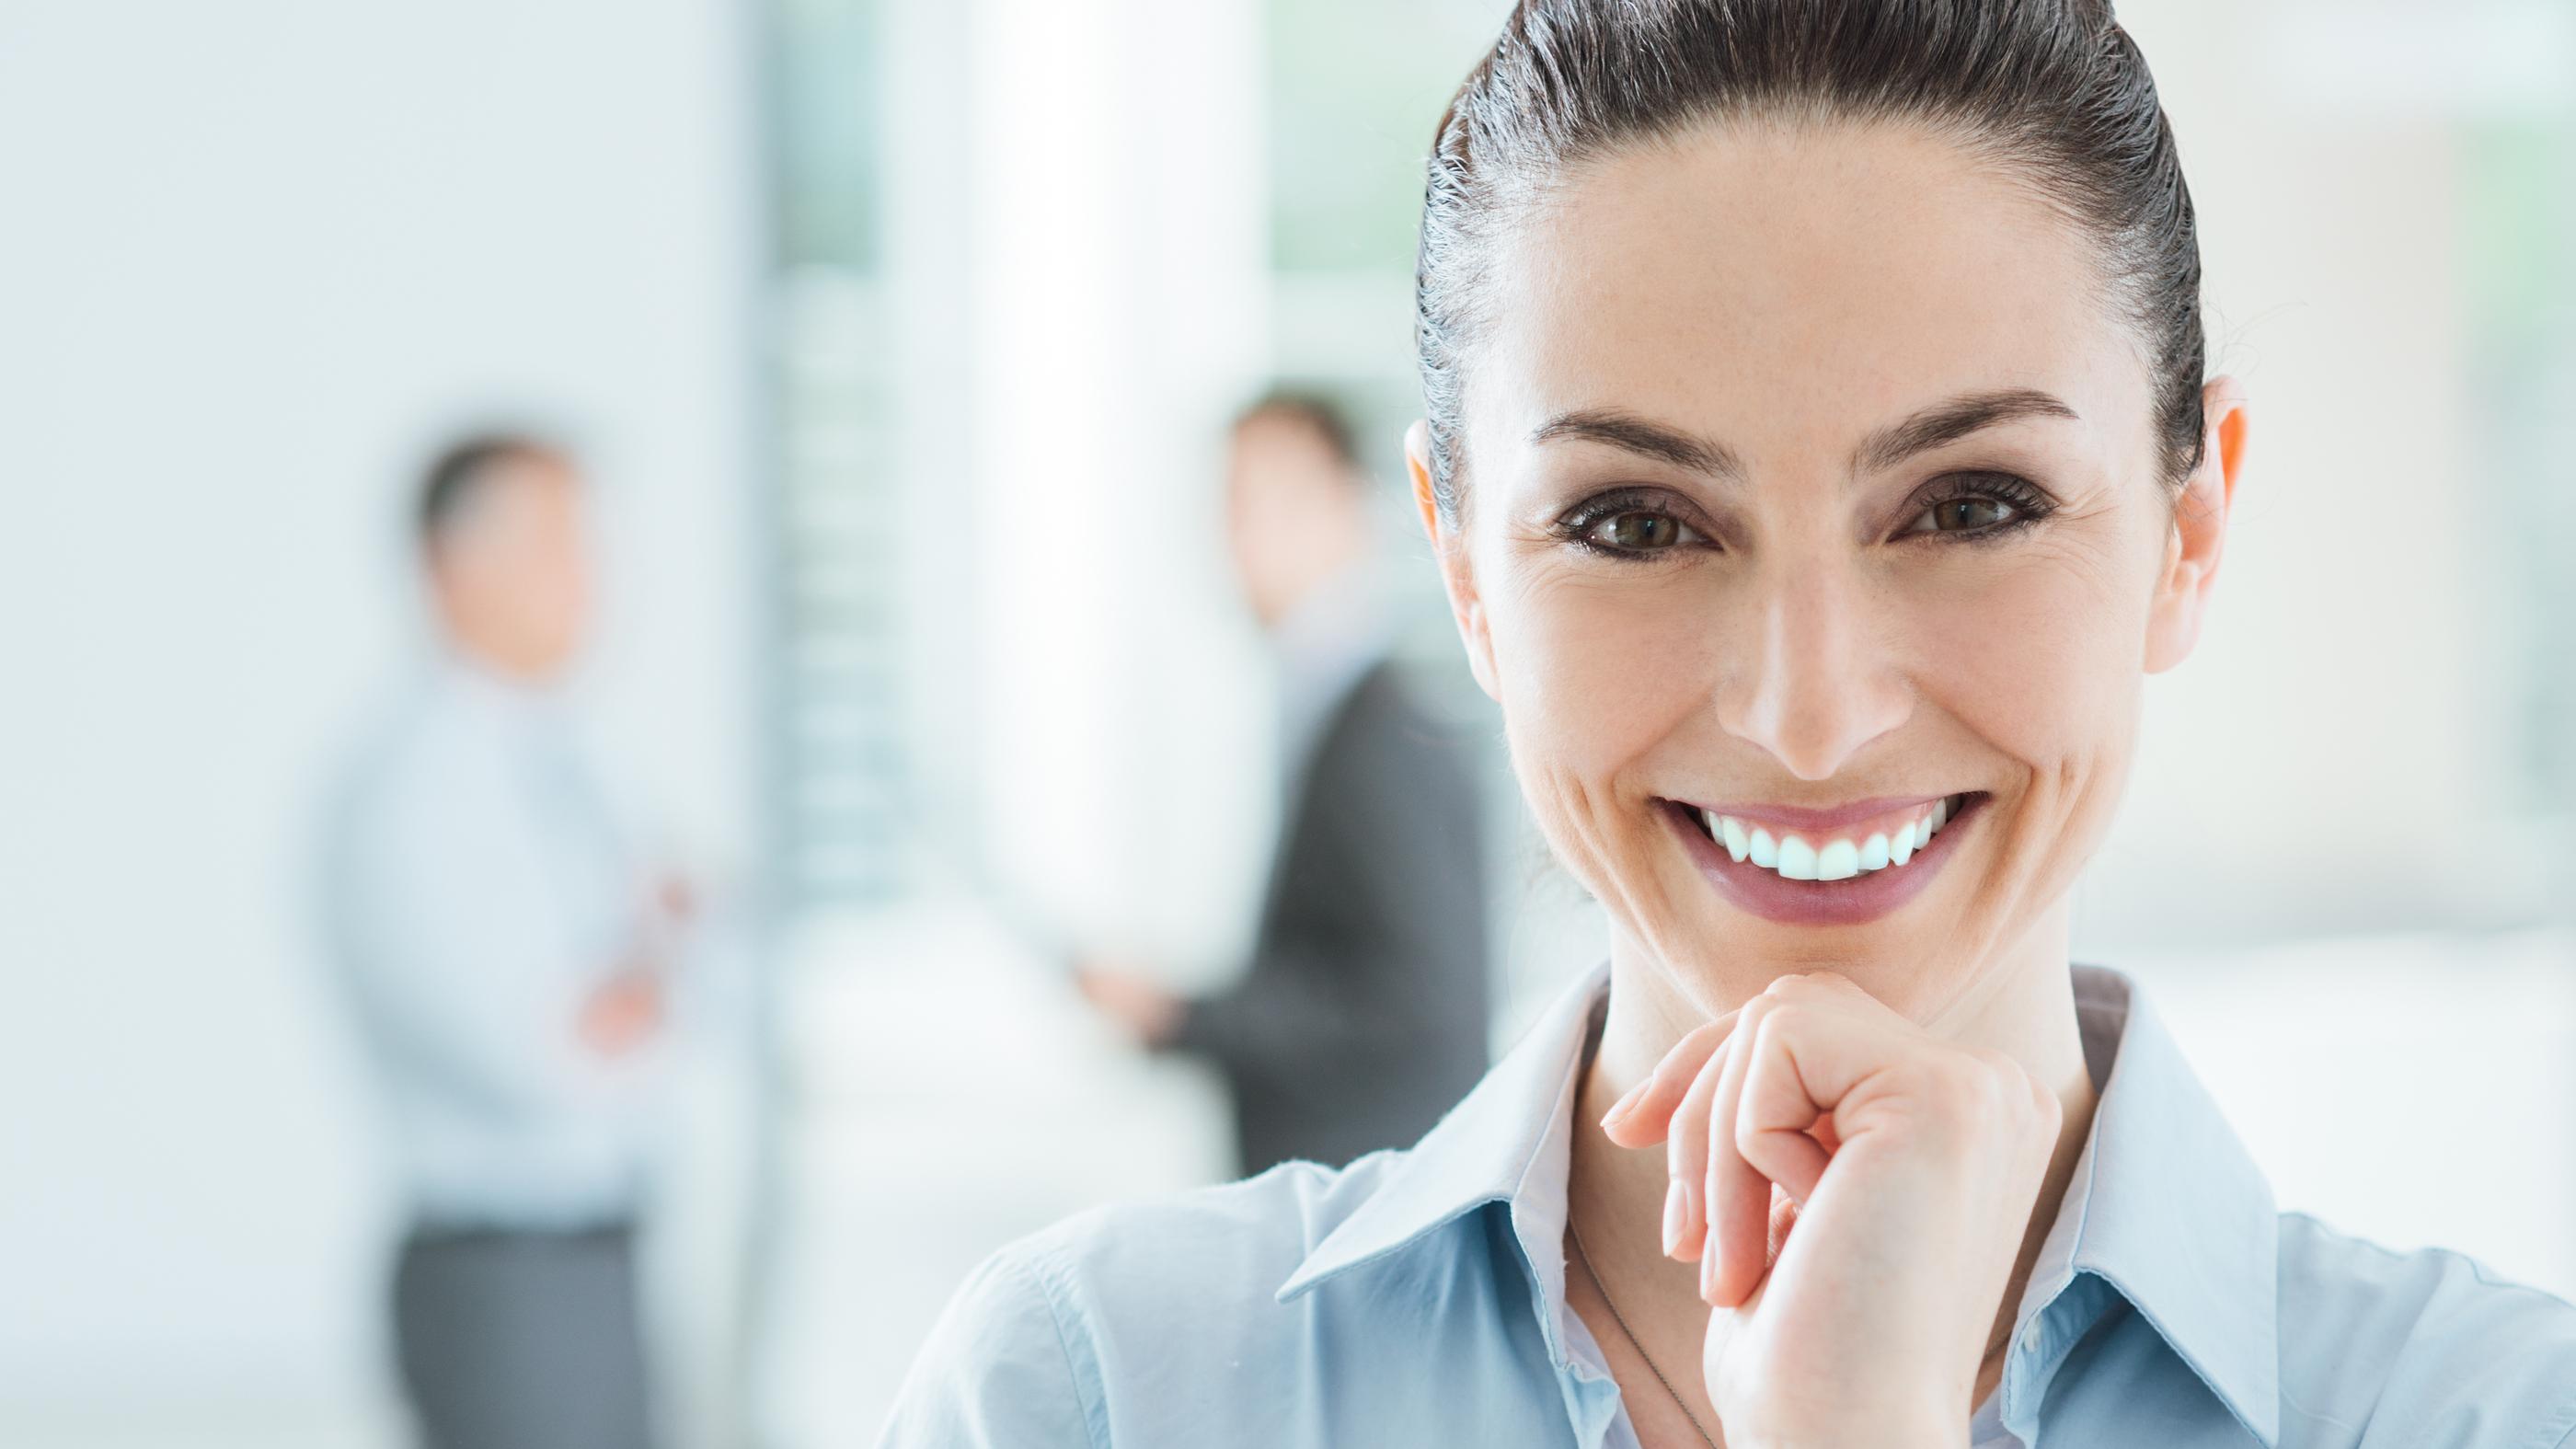 Getting Buy-in for Leadership Development Training